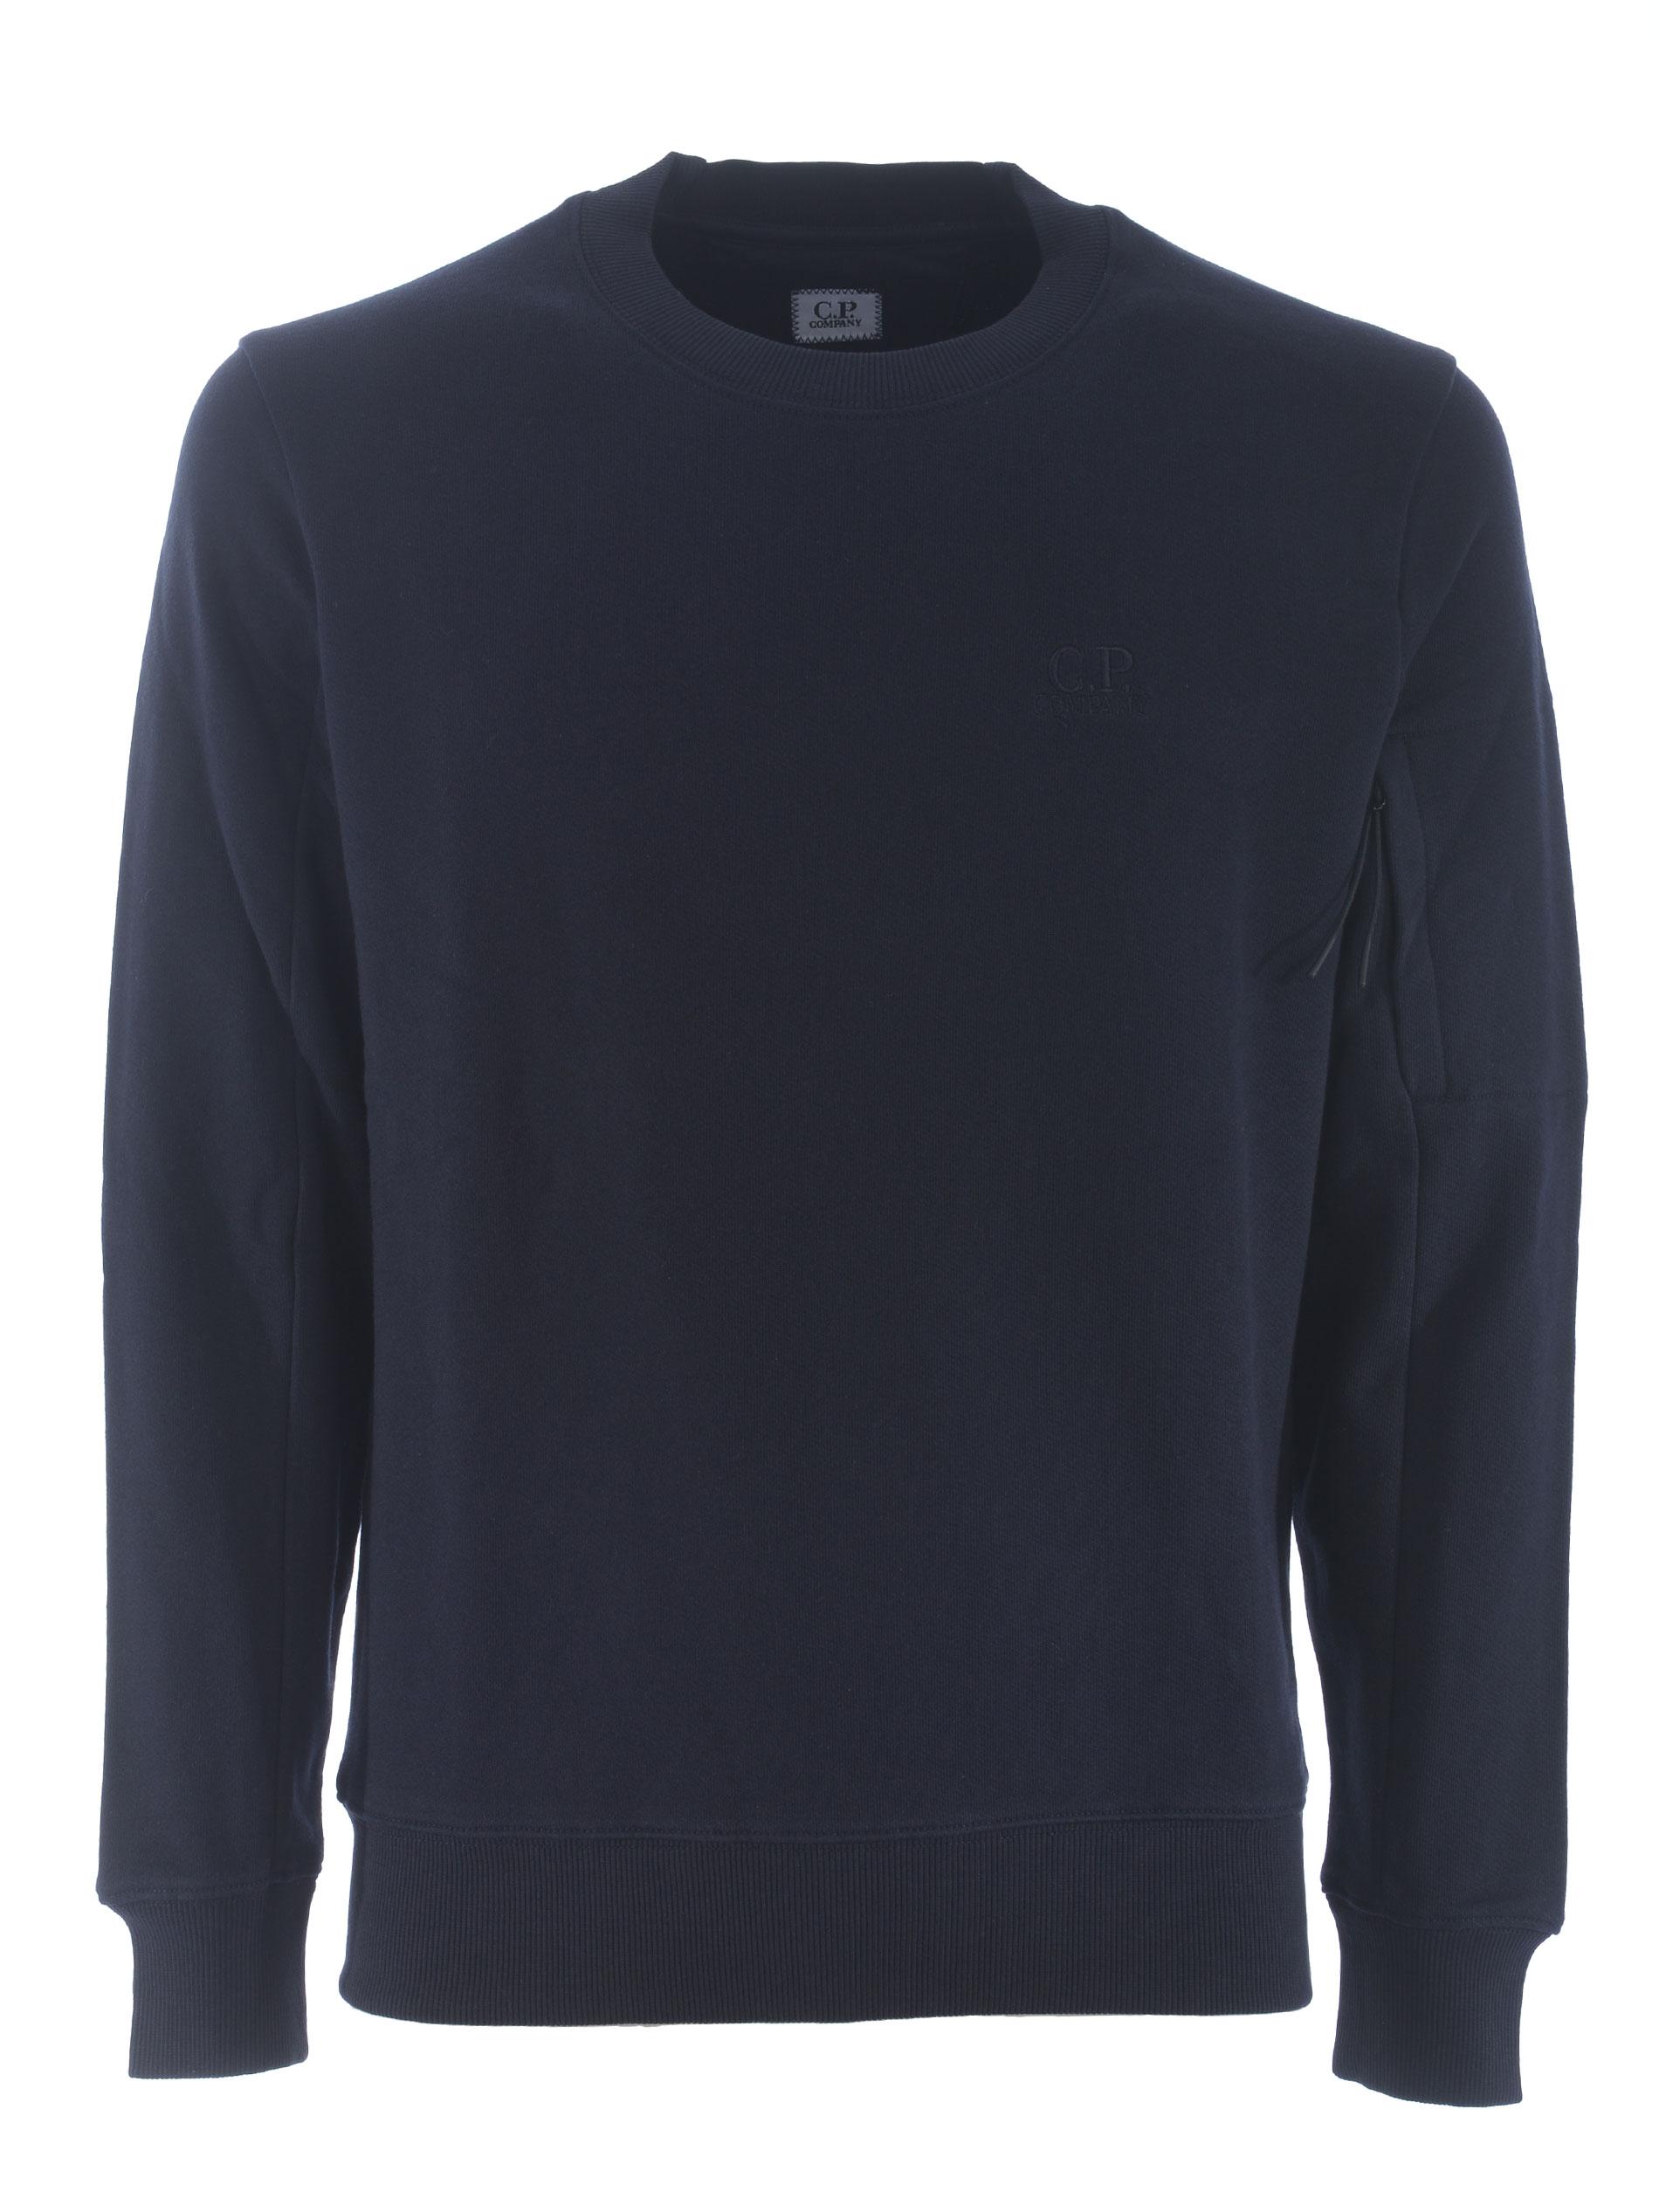 C.P. Company cotton sweatshirt